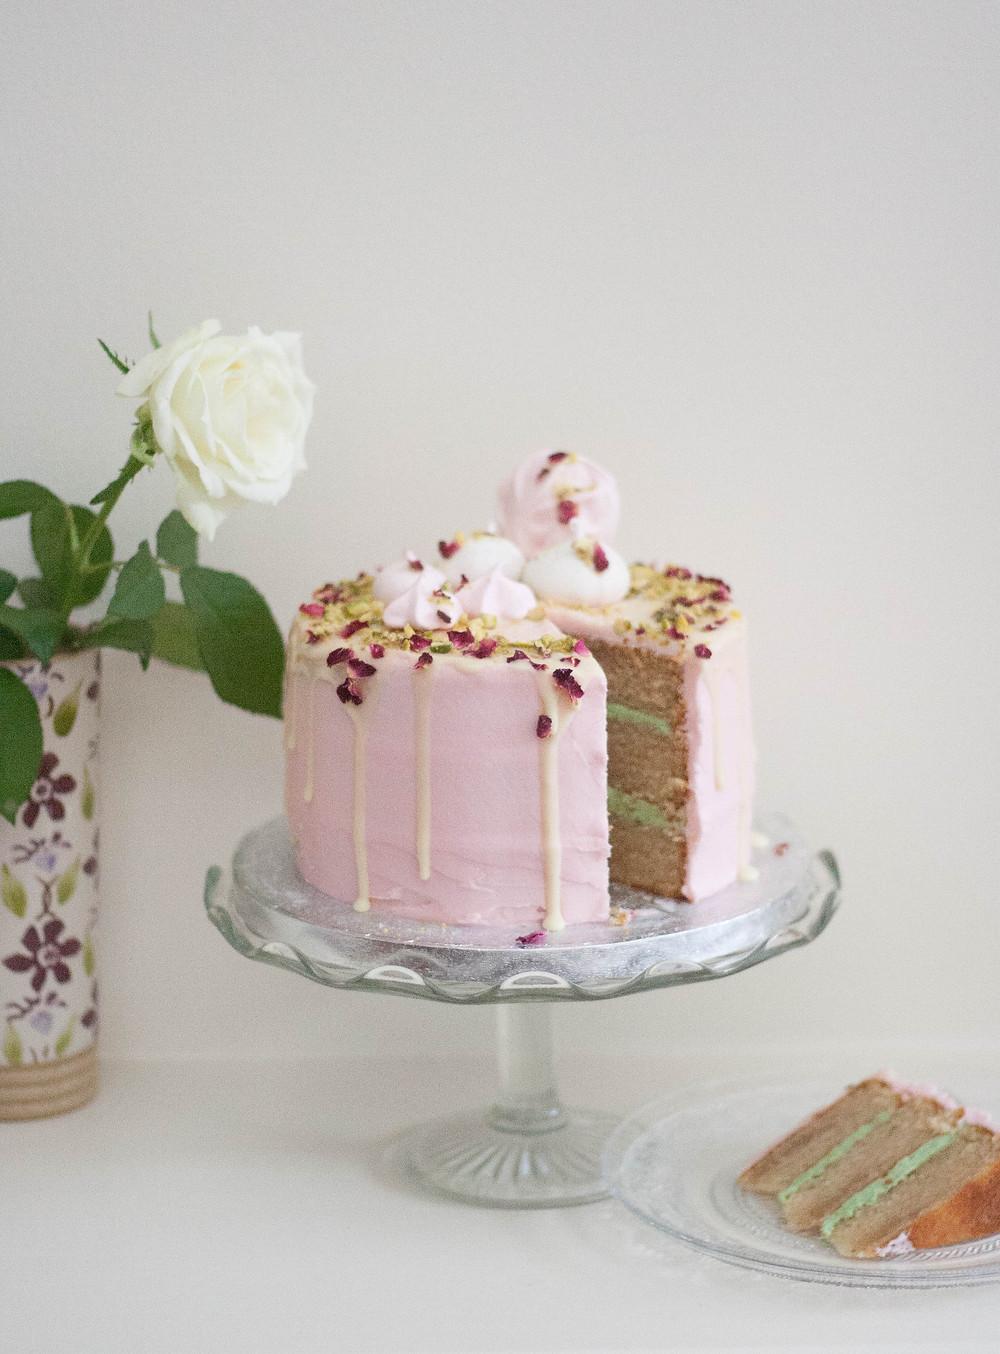 Vegan cardamom rose and pistachio cake